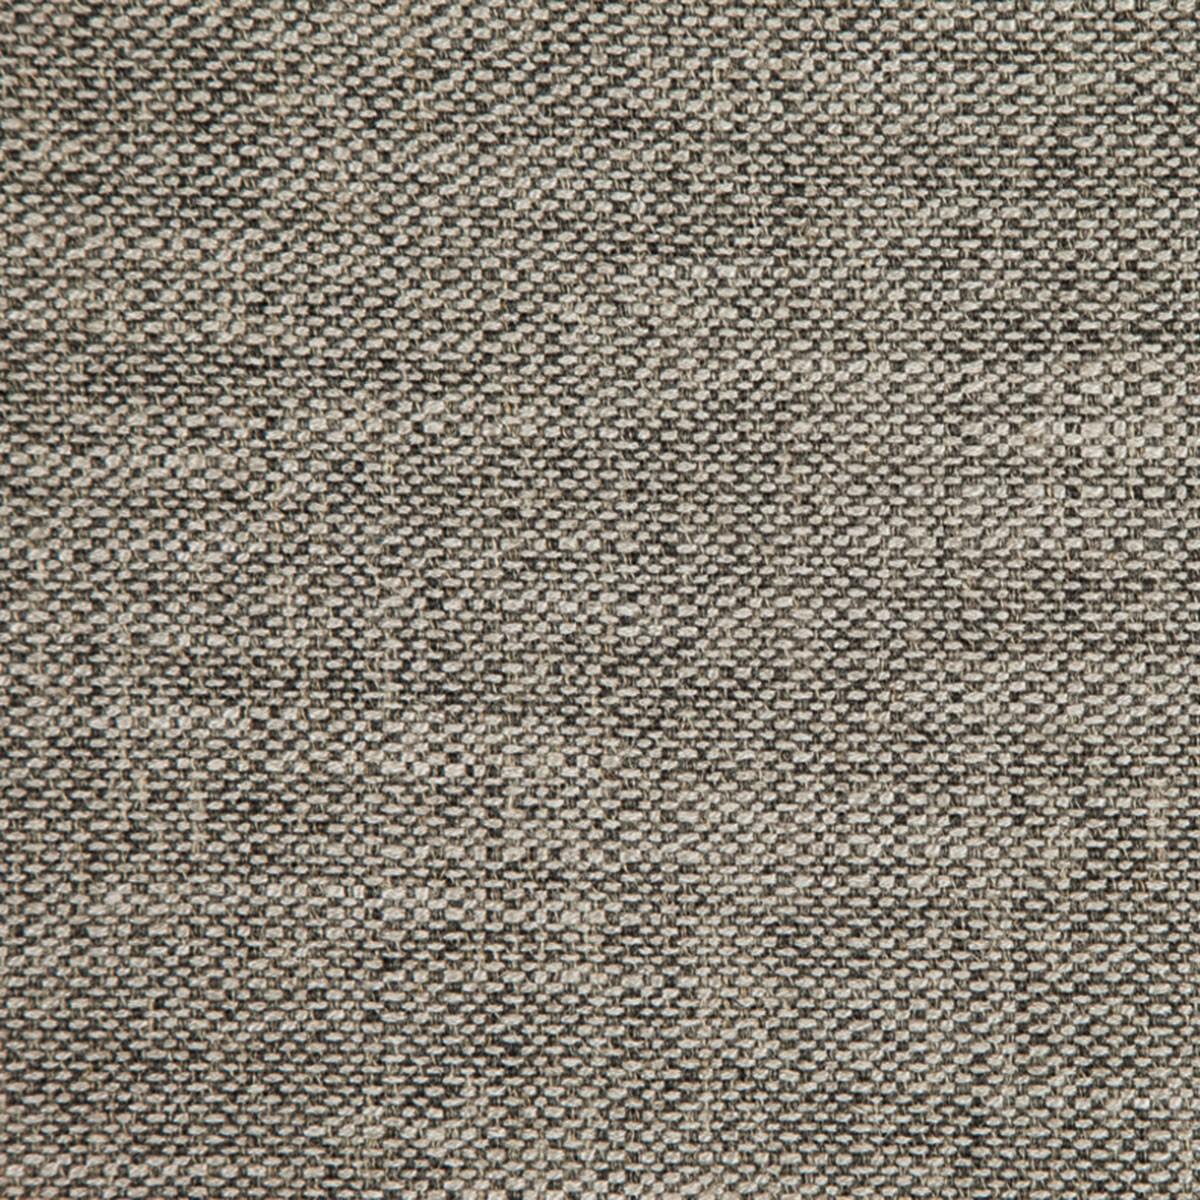 KATHMANDU 13F456